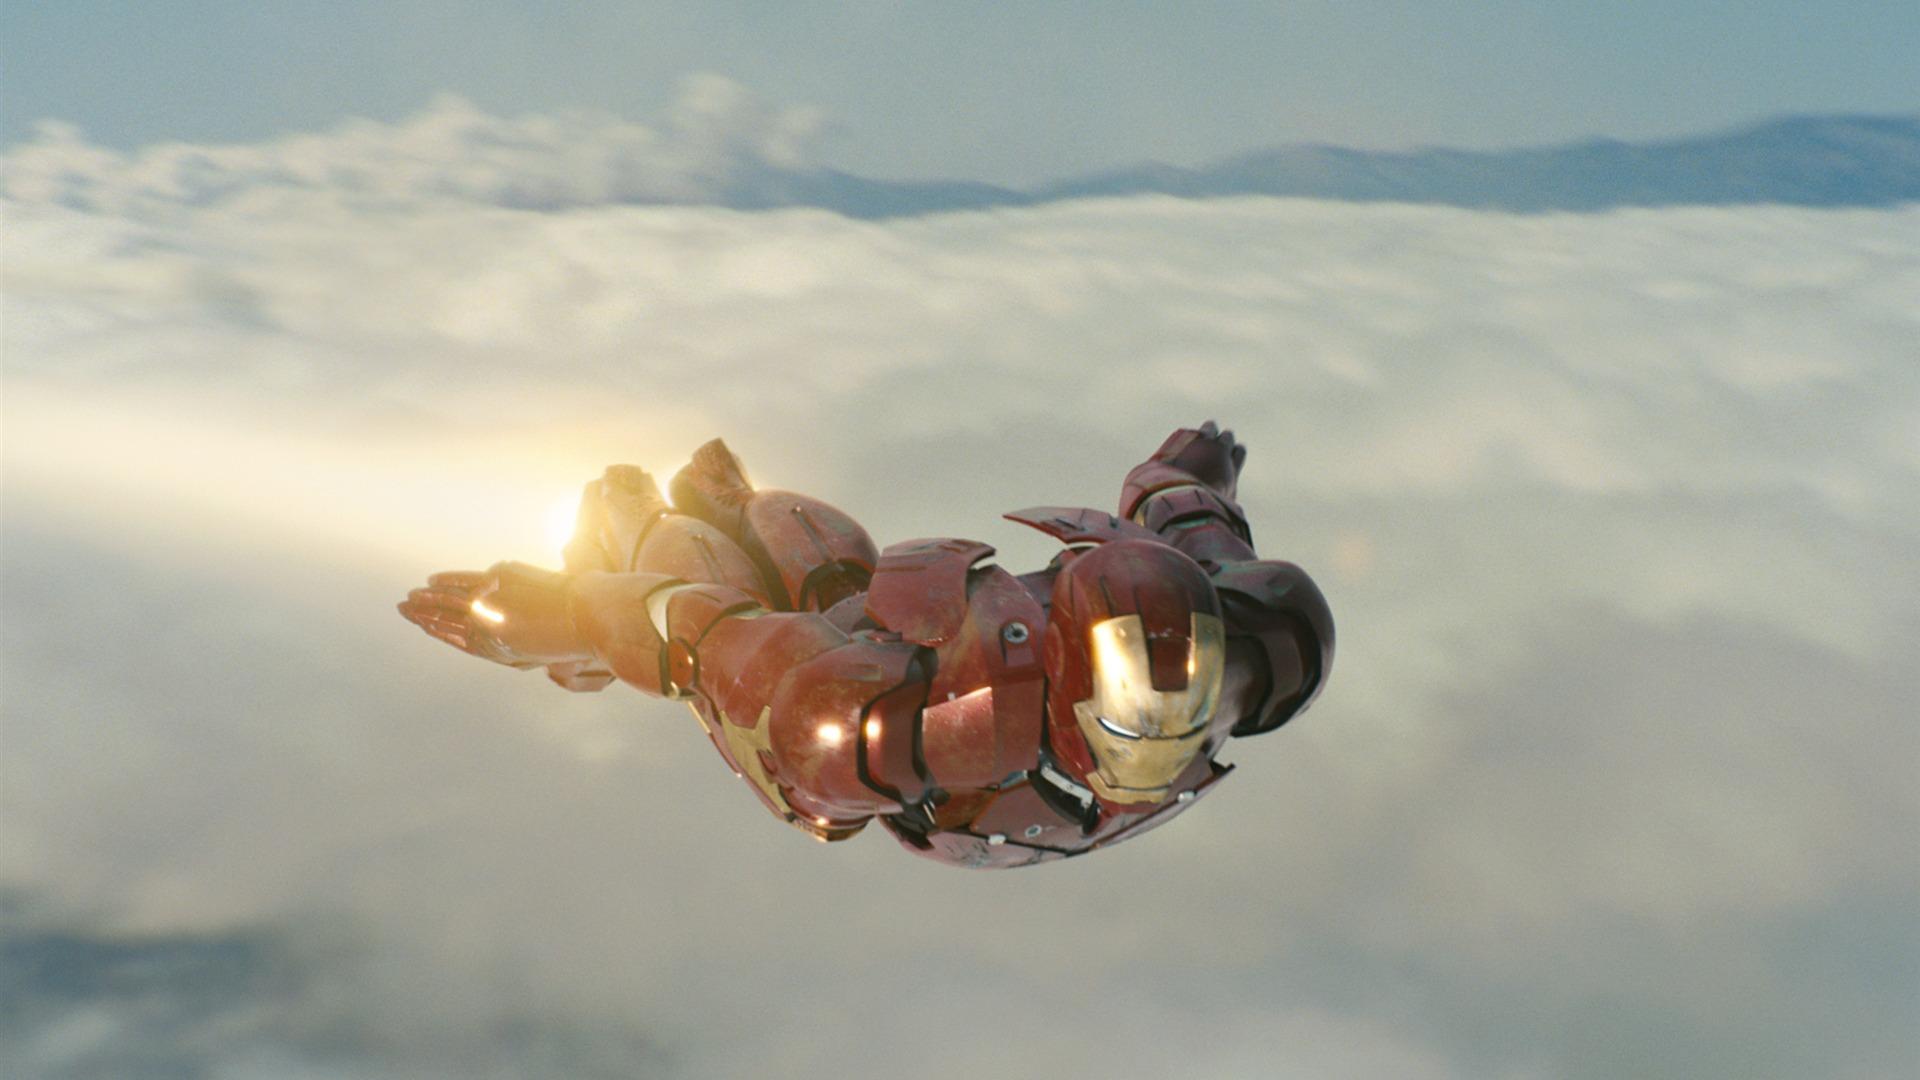 Iron Man Wallpaper 1080p For Desktop